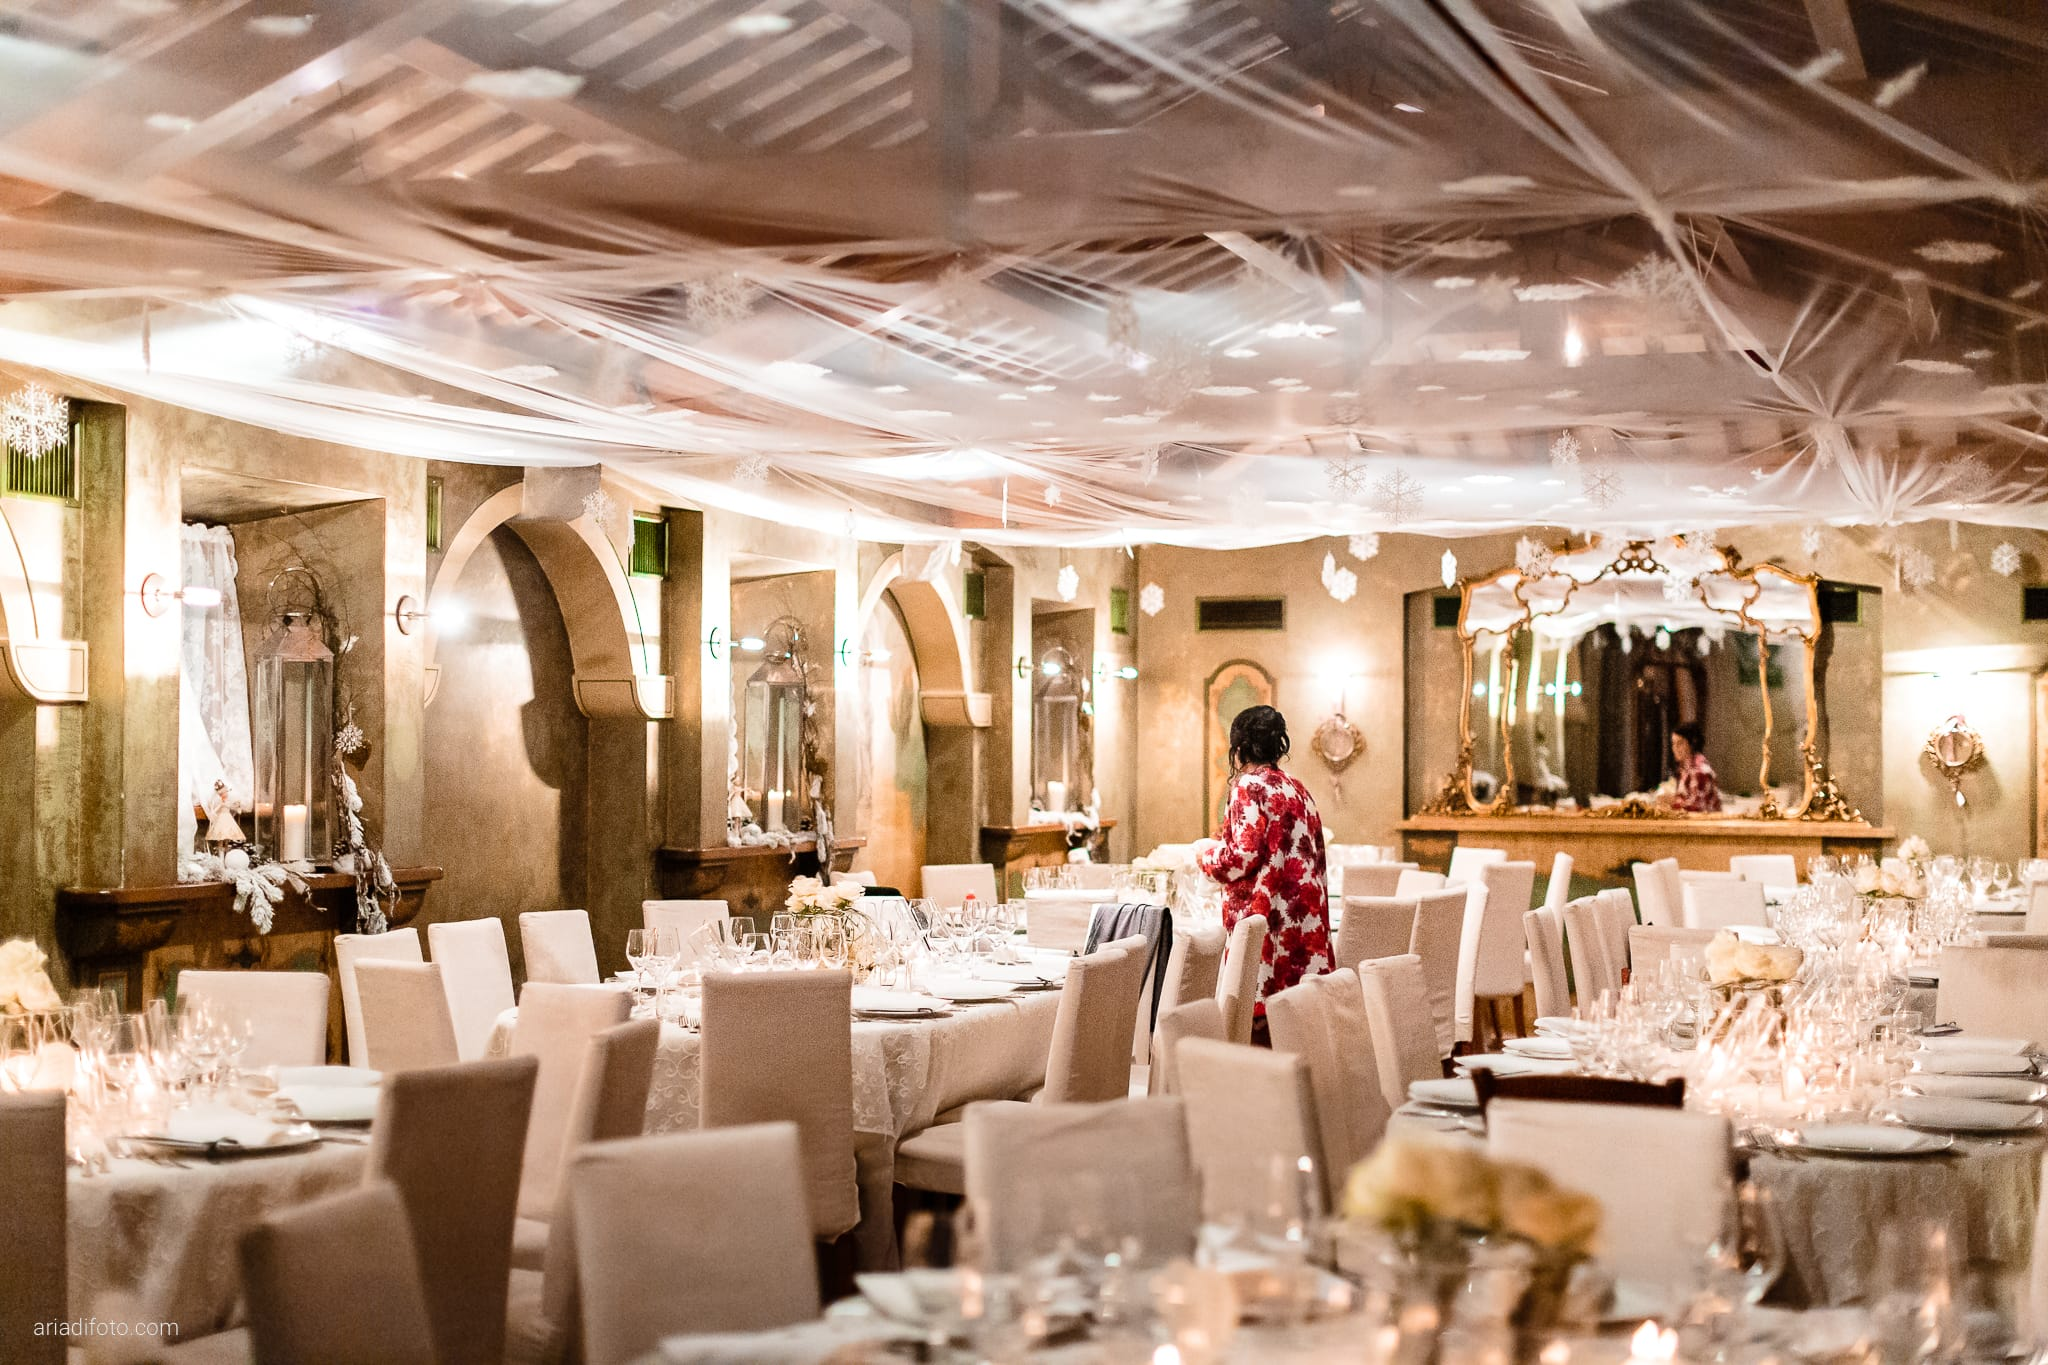 Elisa Matteo matrimonio Preval Gorizia Paradiso Pocenia Udine ricevimento dettagli sala decorazioni allestimenti tavoli